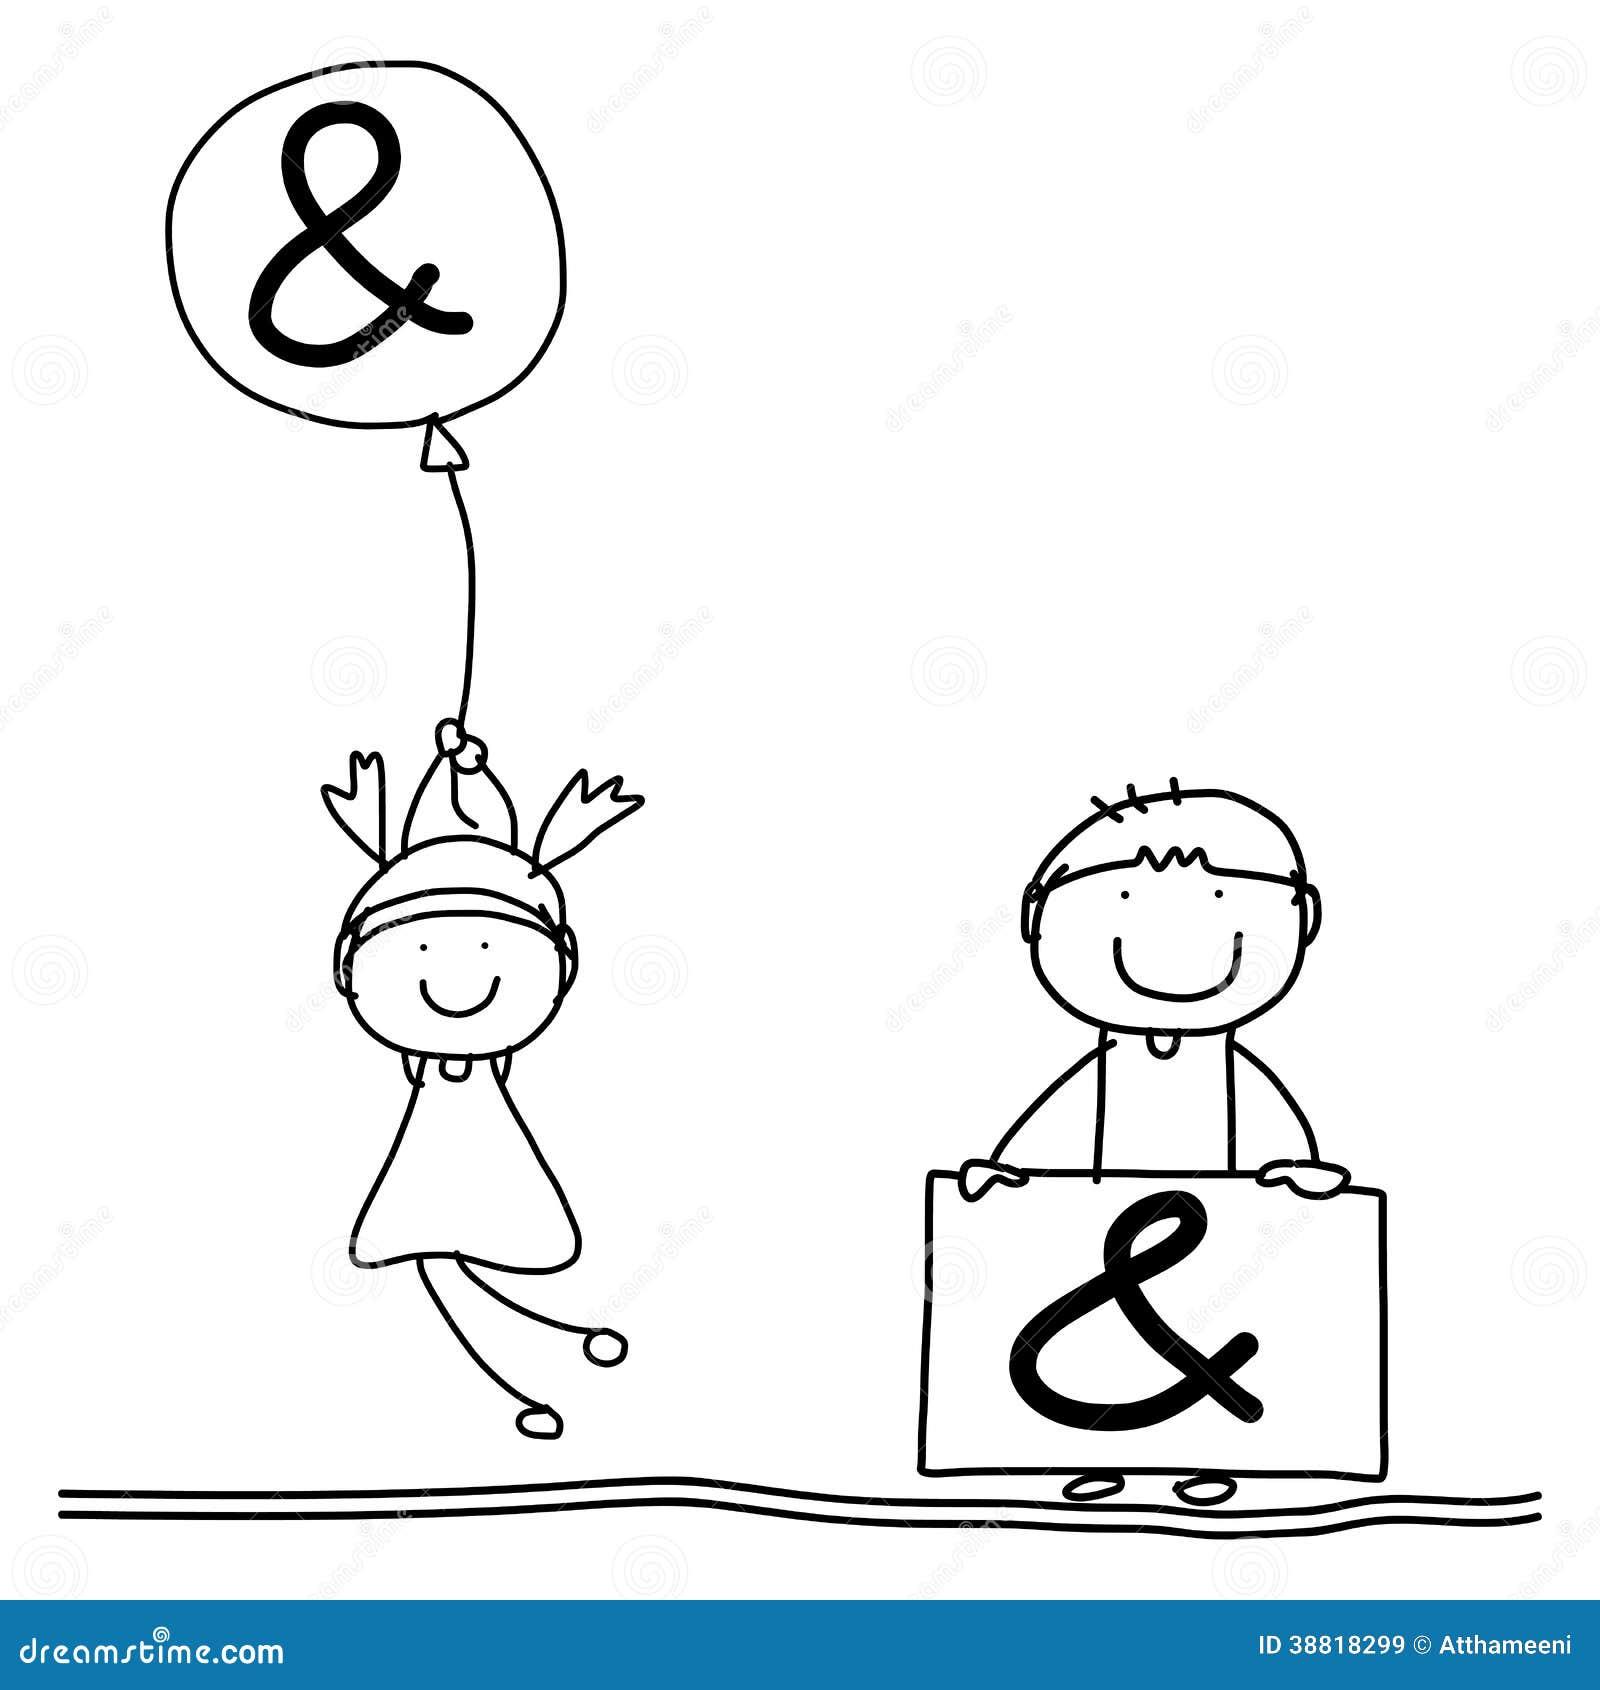 Alphabet De Bonheur De Bande Dessinee De Dessin De Main Illustration